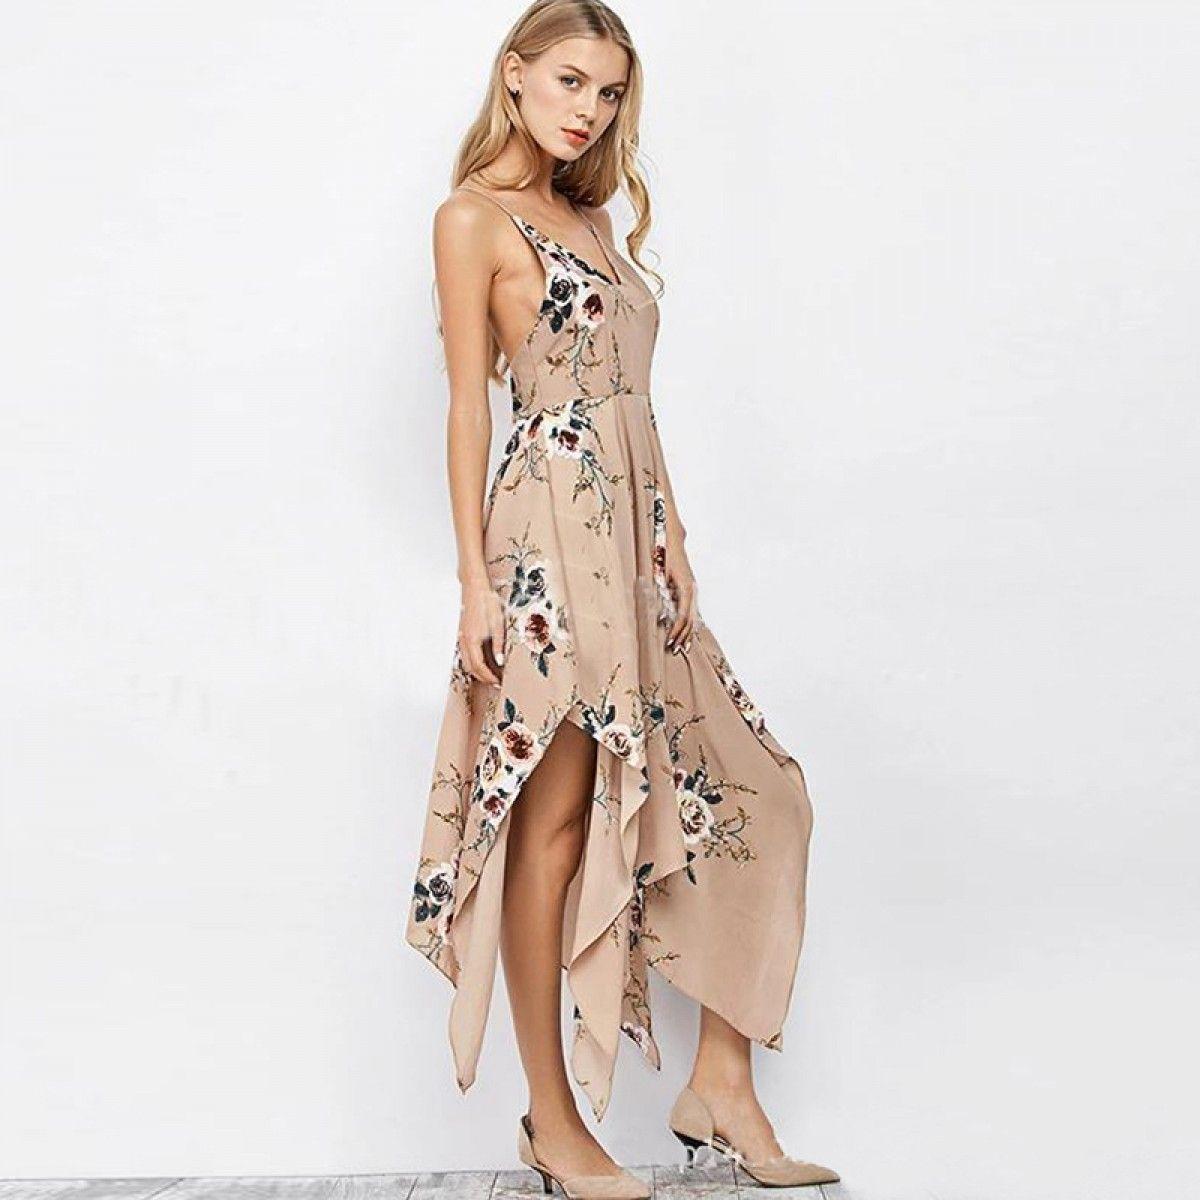 dd0fc600a2e Sexy Spaghetti Criss-Cross Straps Asymmtrical Floral Boho Dress